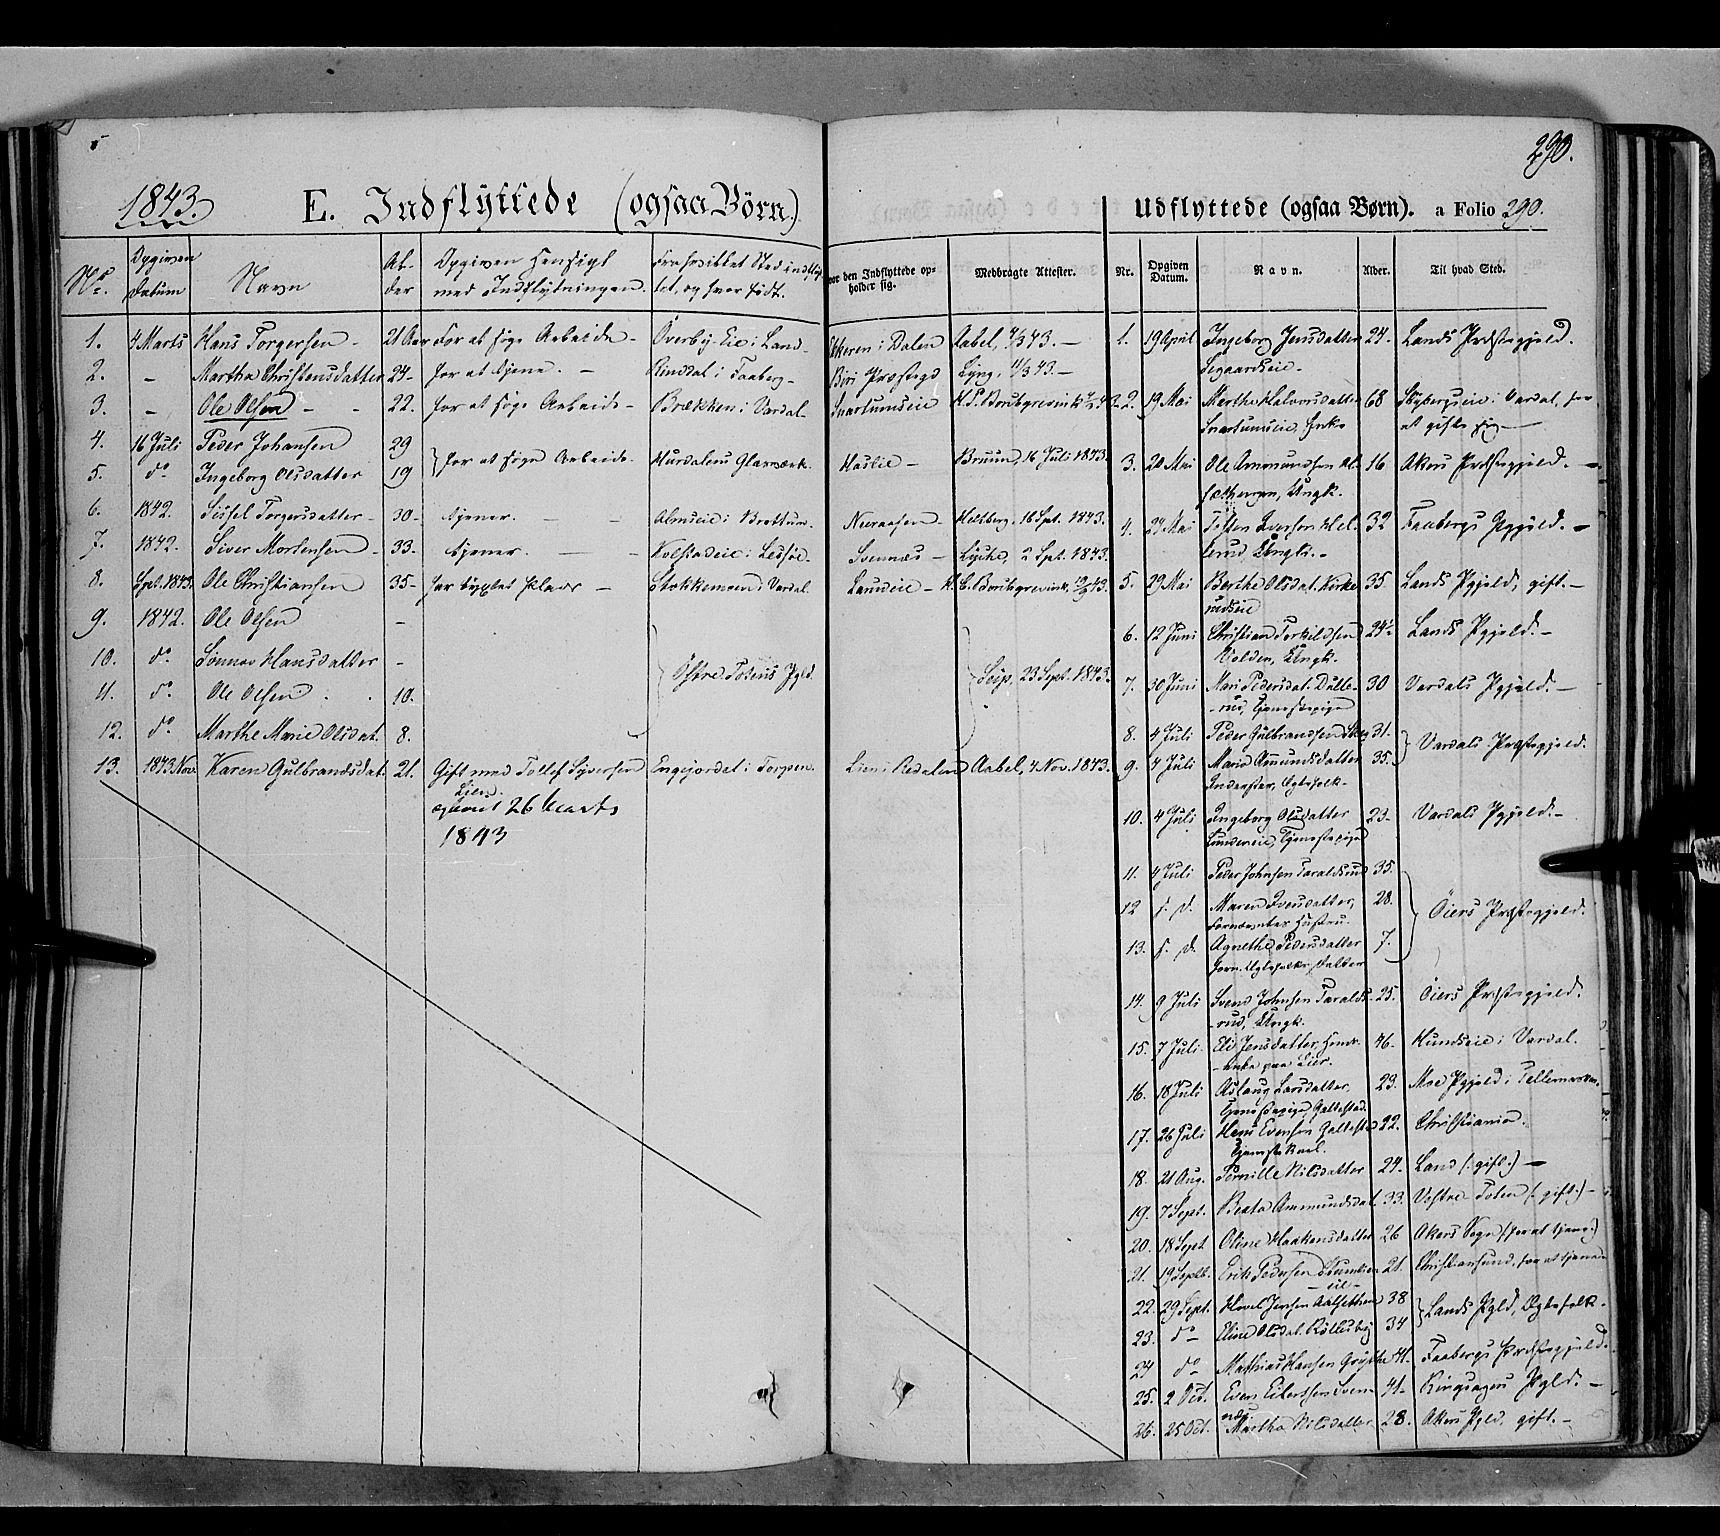 SAH, Biri prestekontor, Ministerialbok nr. 5, 1843-1854, s. 290